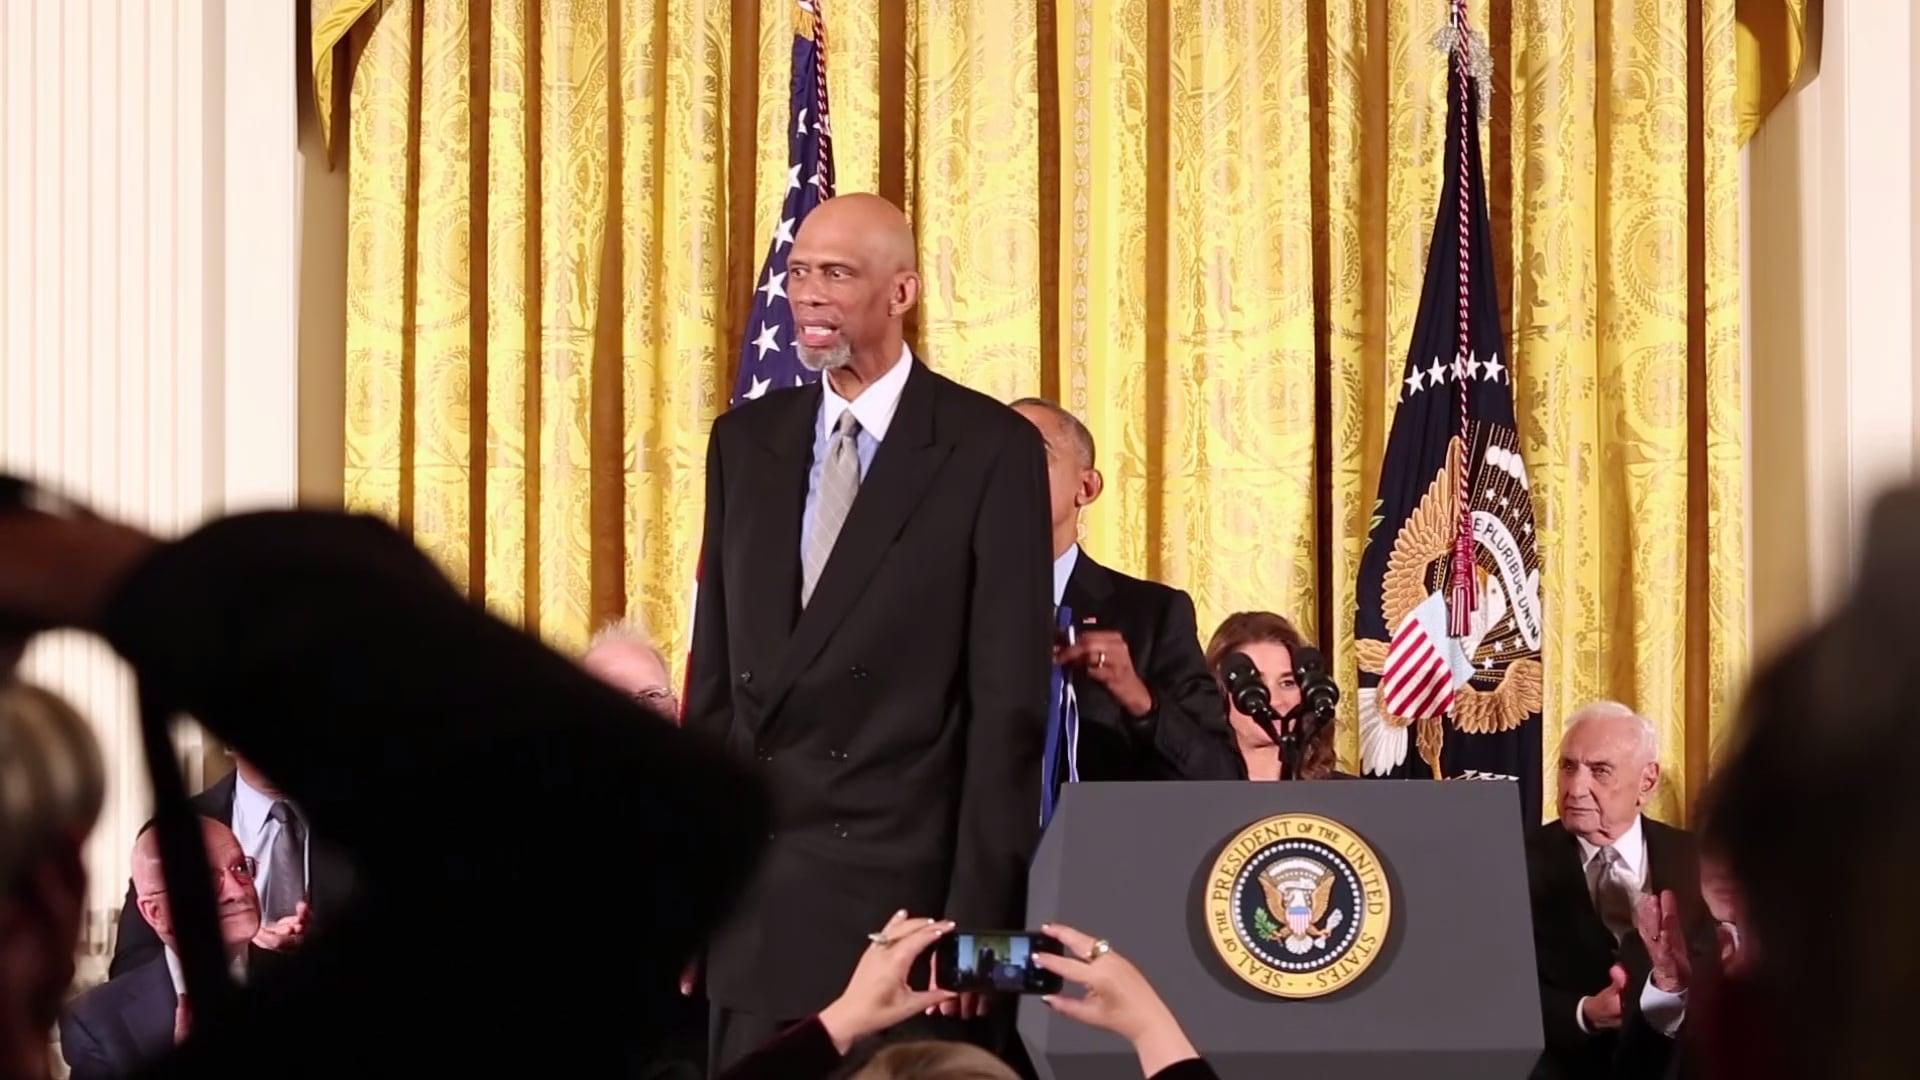 Kareem Abdul-Jabbar Receives the Presidential Medal of Freedom